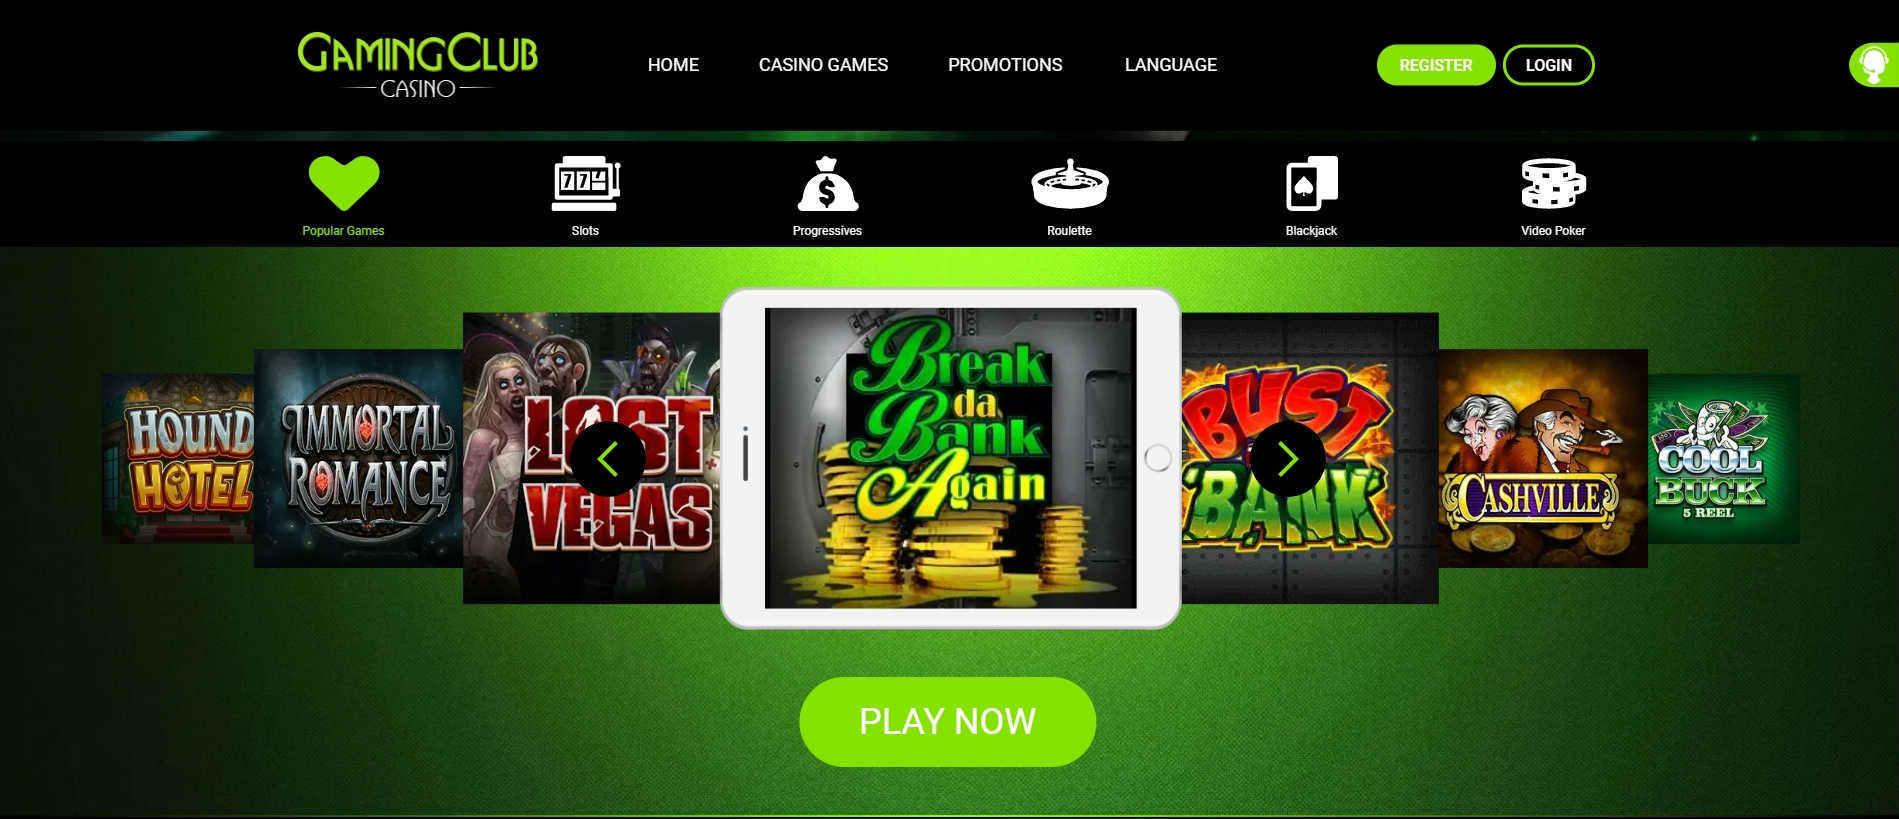 Gaming Club Casino Online Casino Games